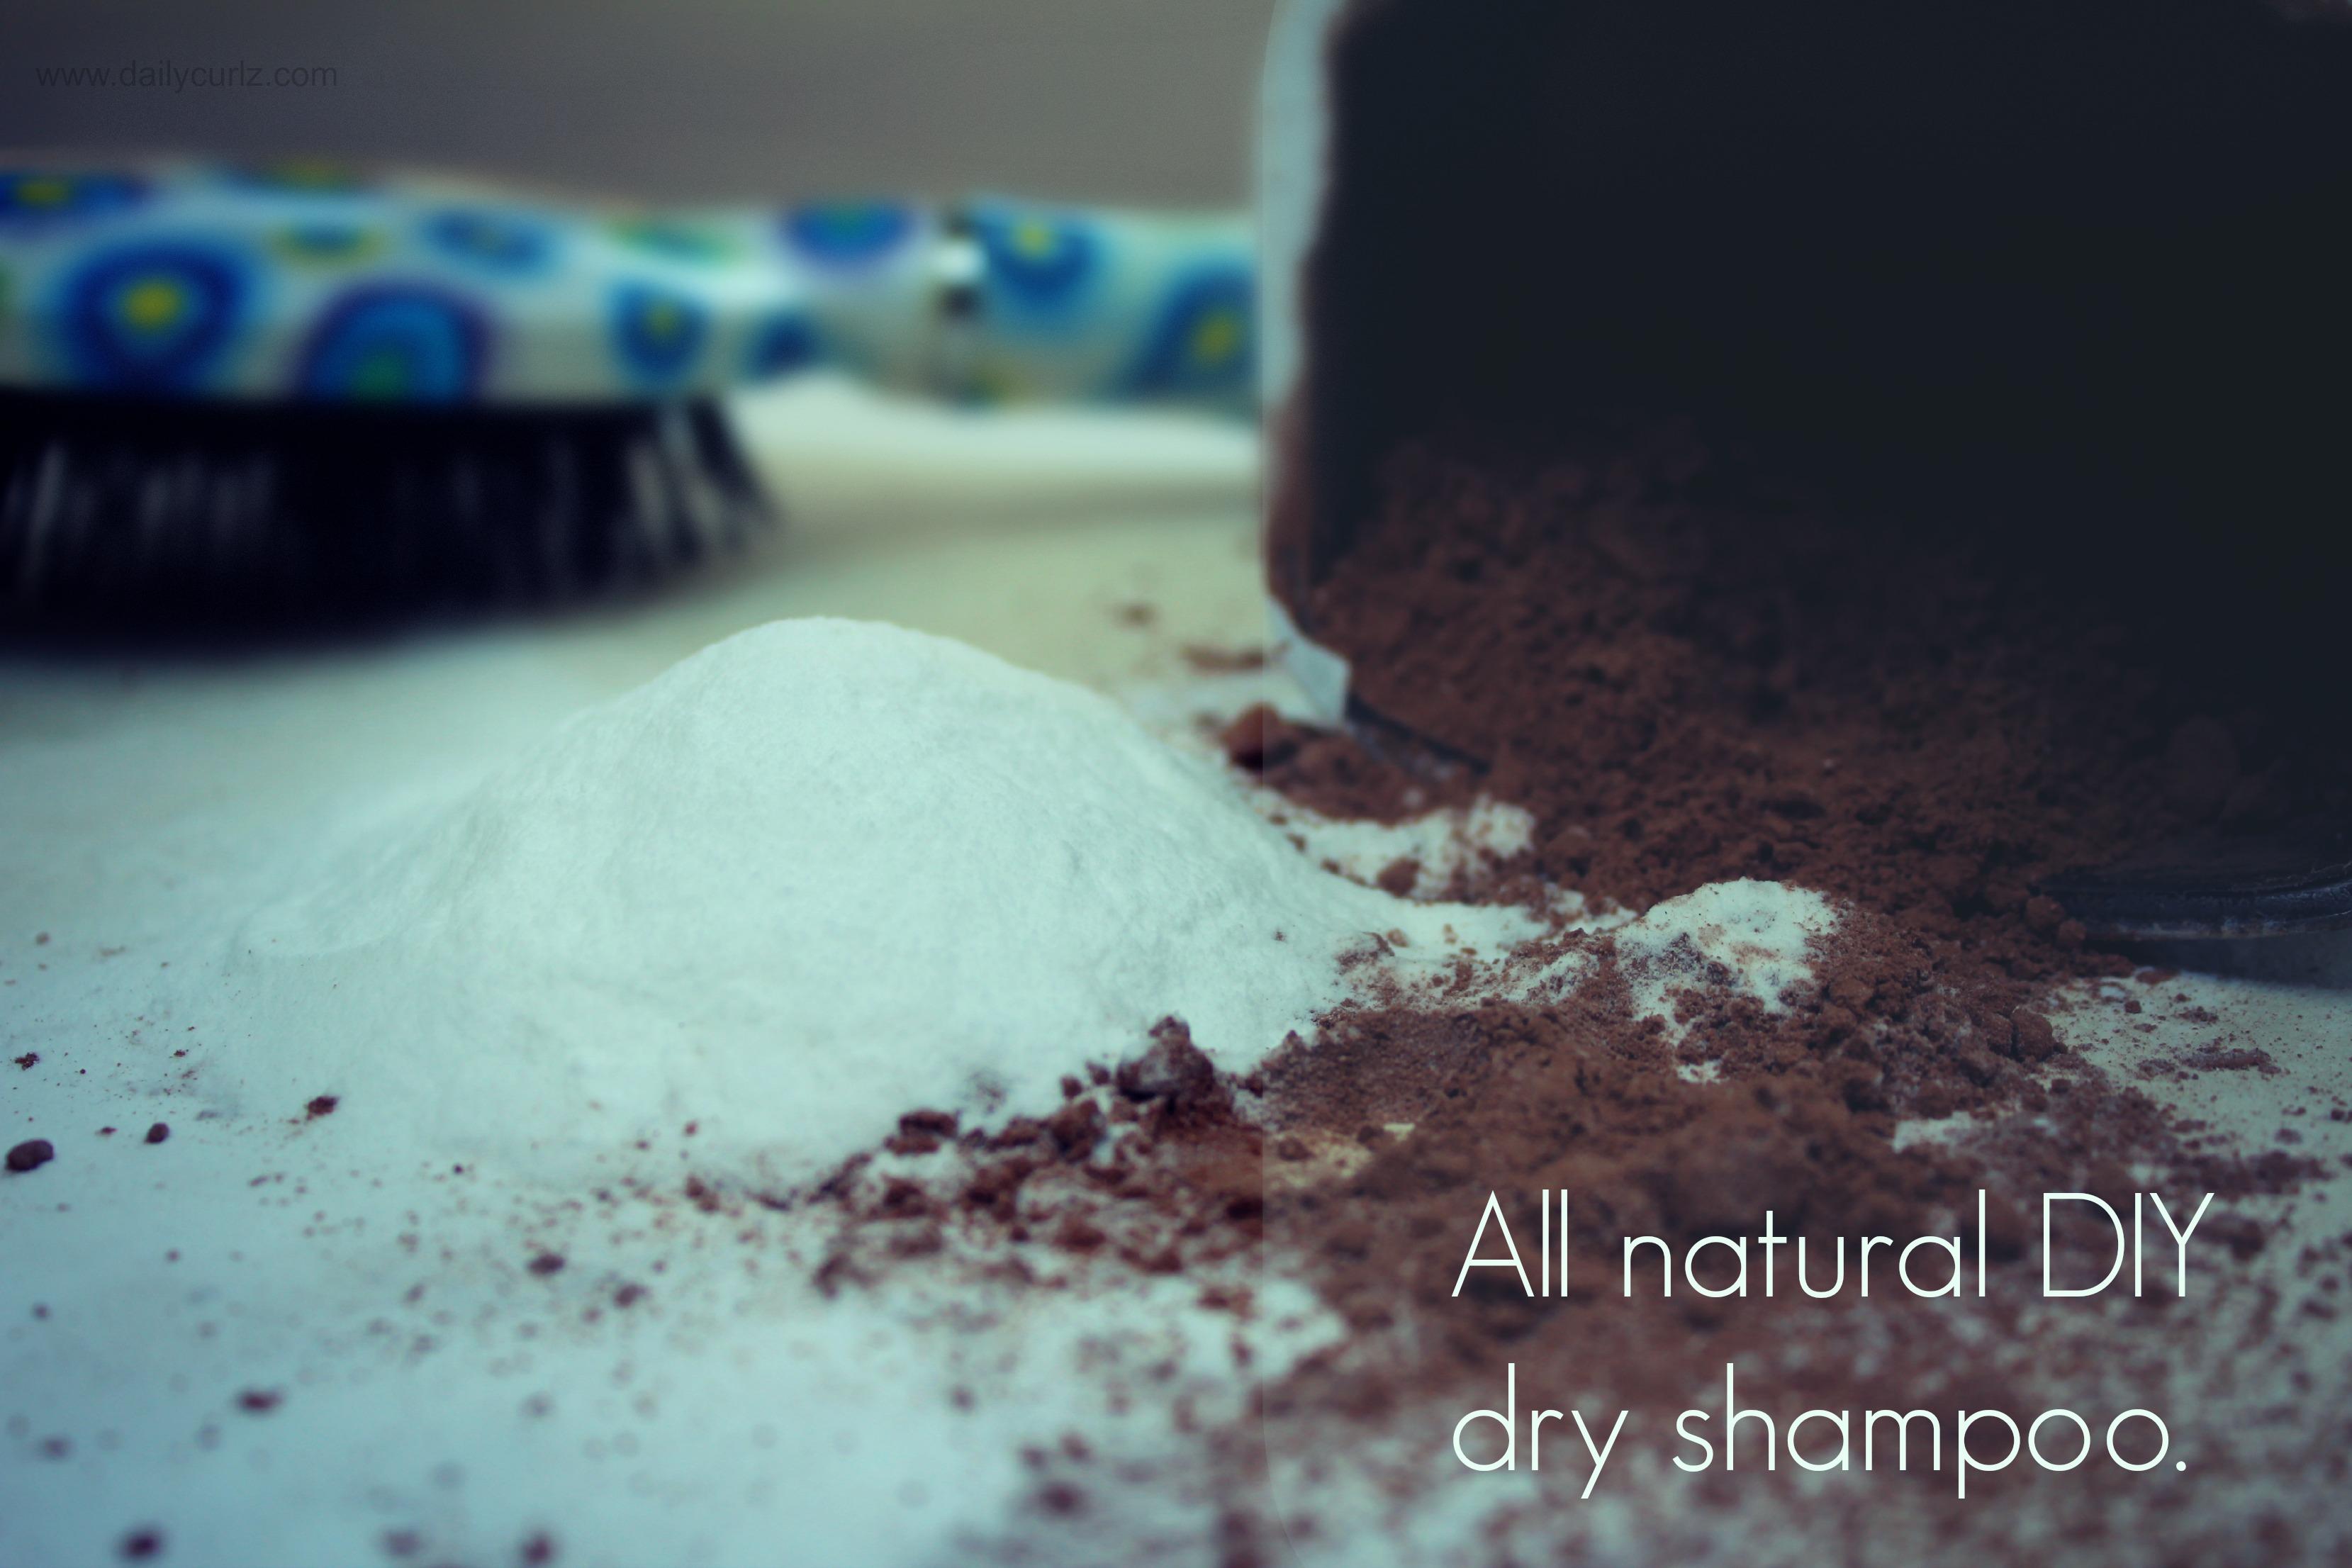 All Natural DIY Dry Shampoo/ Champú en seco casero